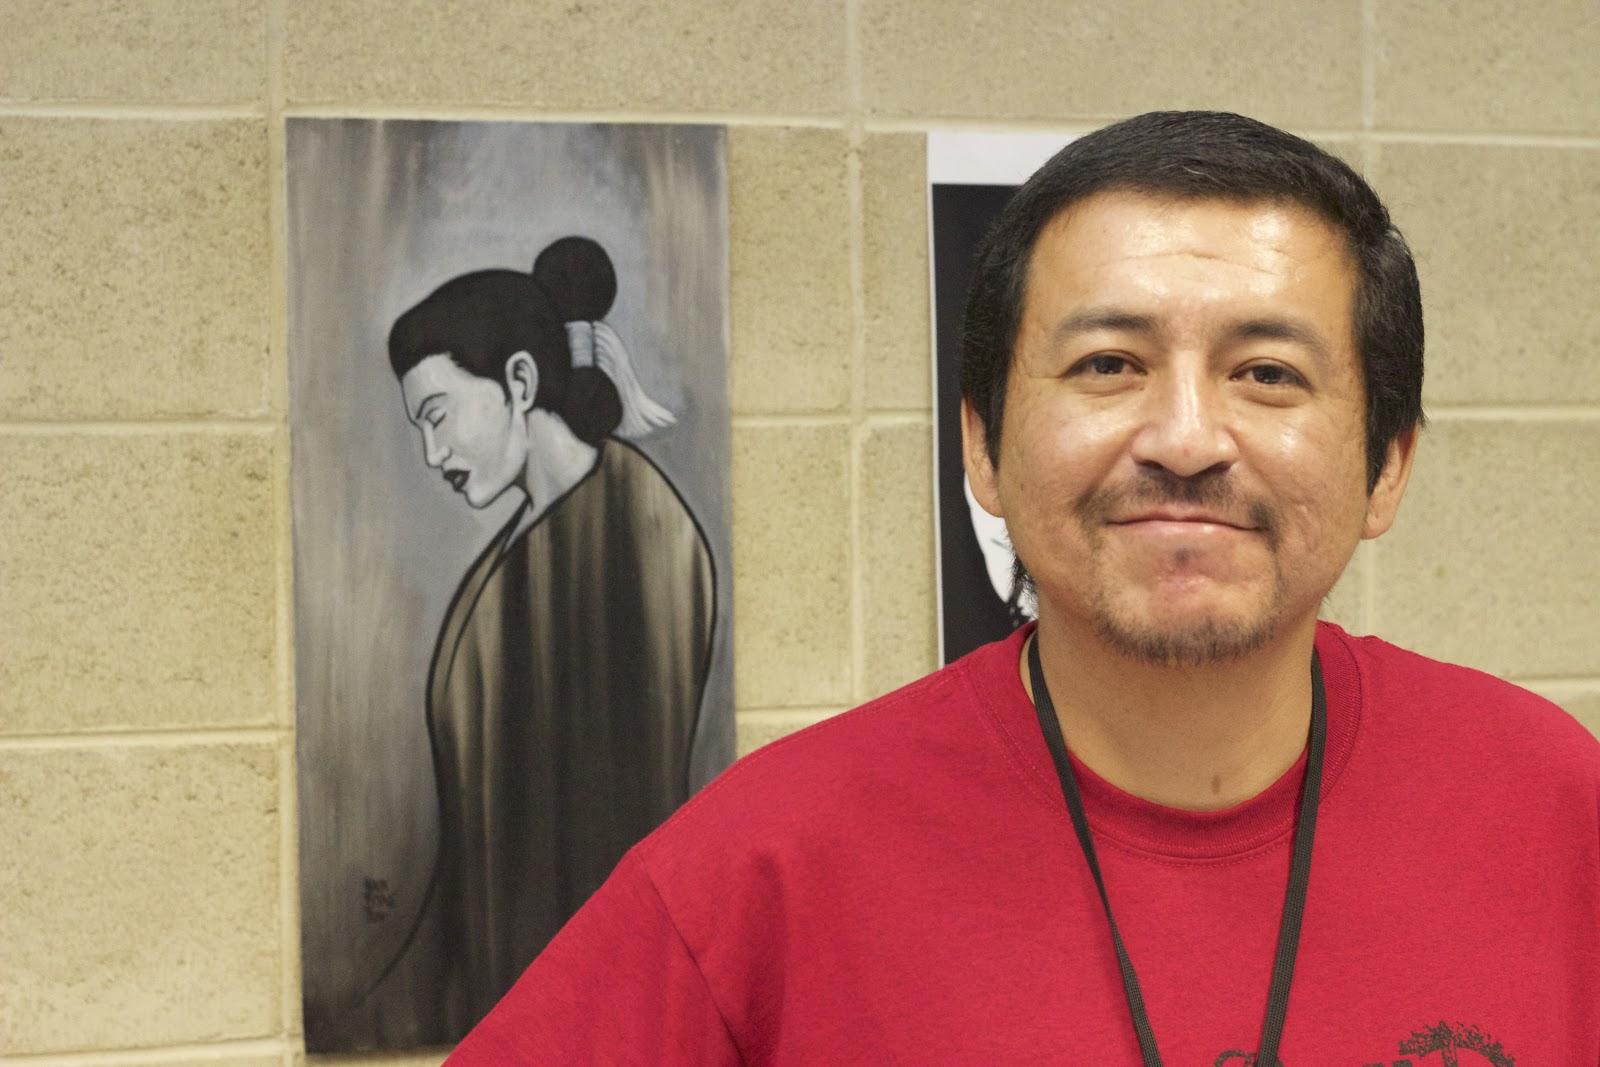 Navajo artist Shaun Beyale empowering women. Photo: Jason Asenap